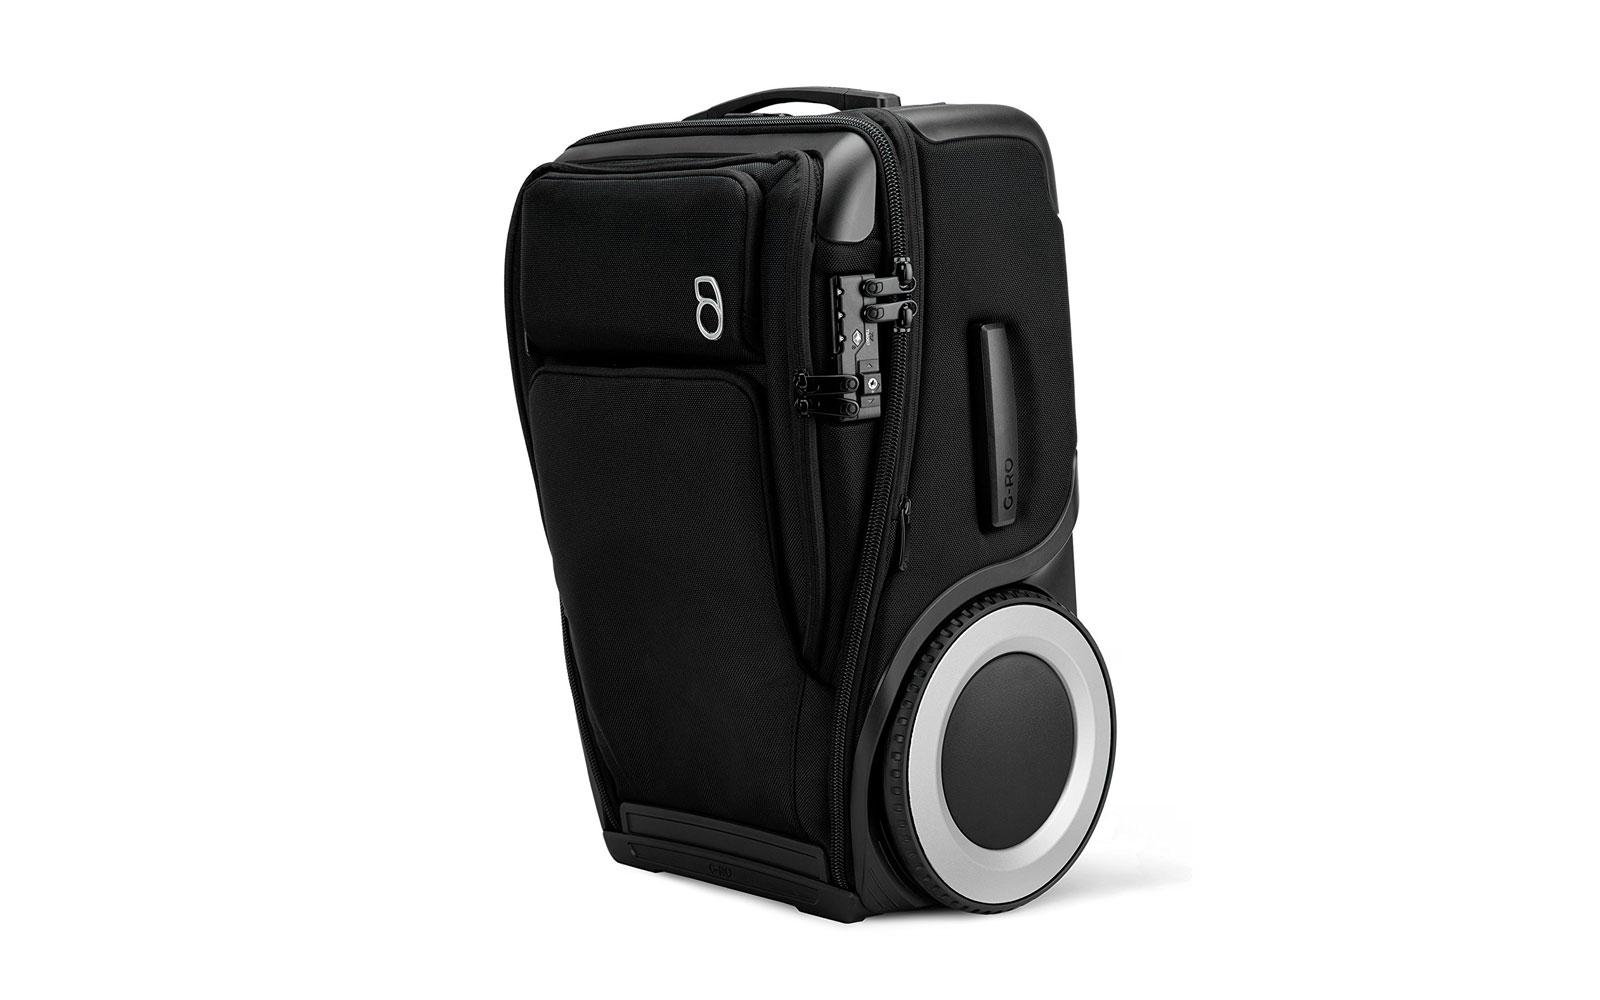 g-ro smart luggage